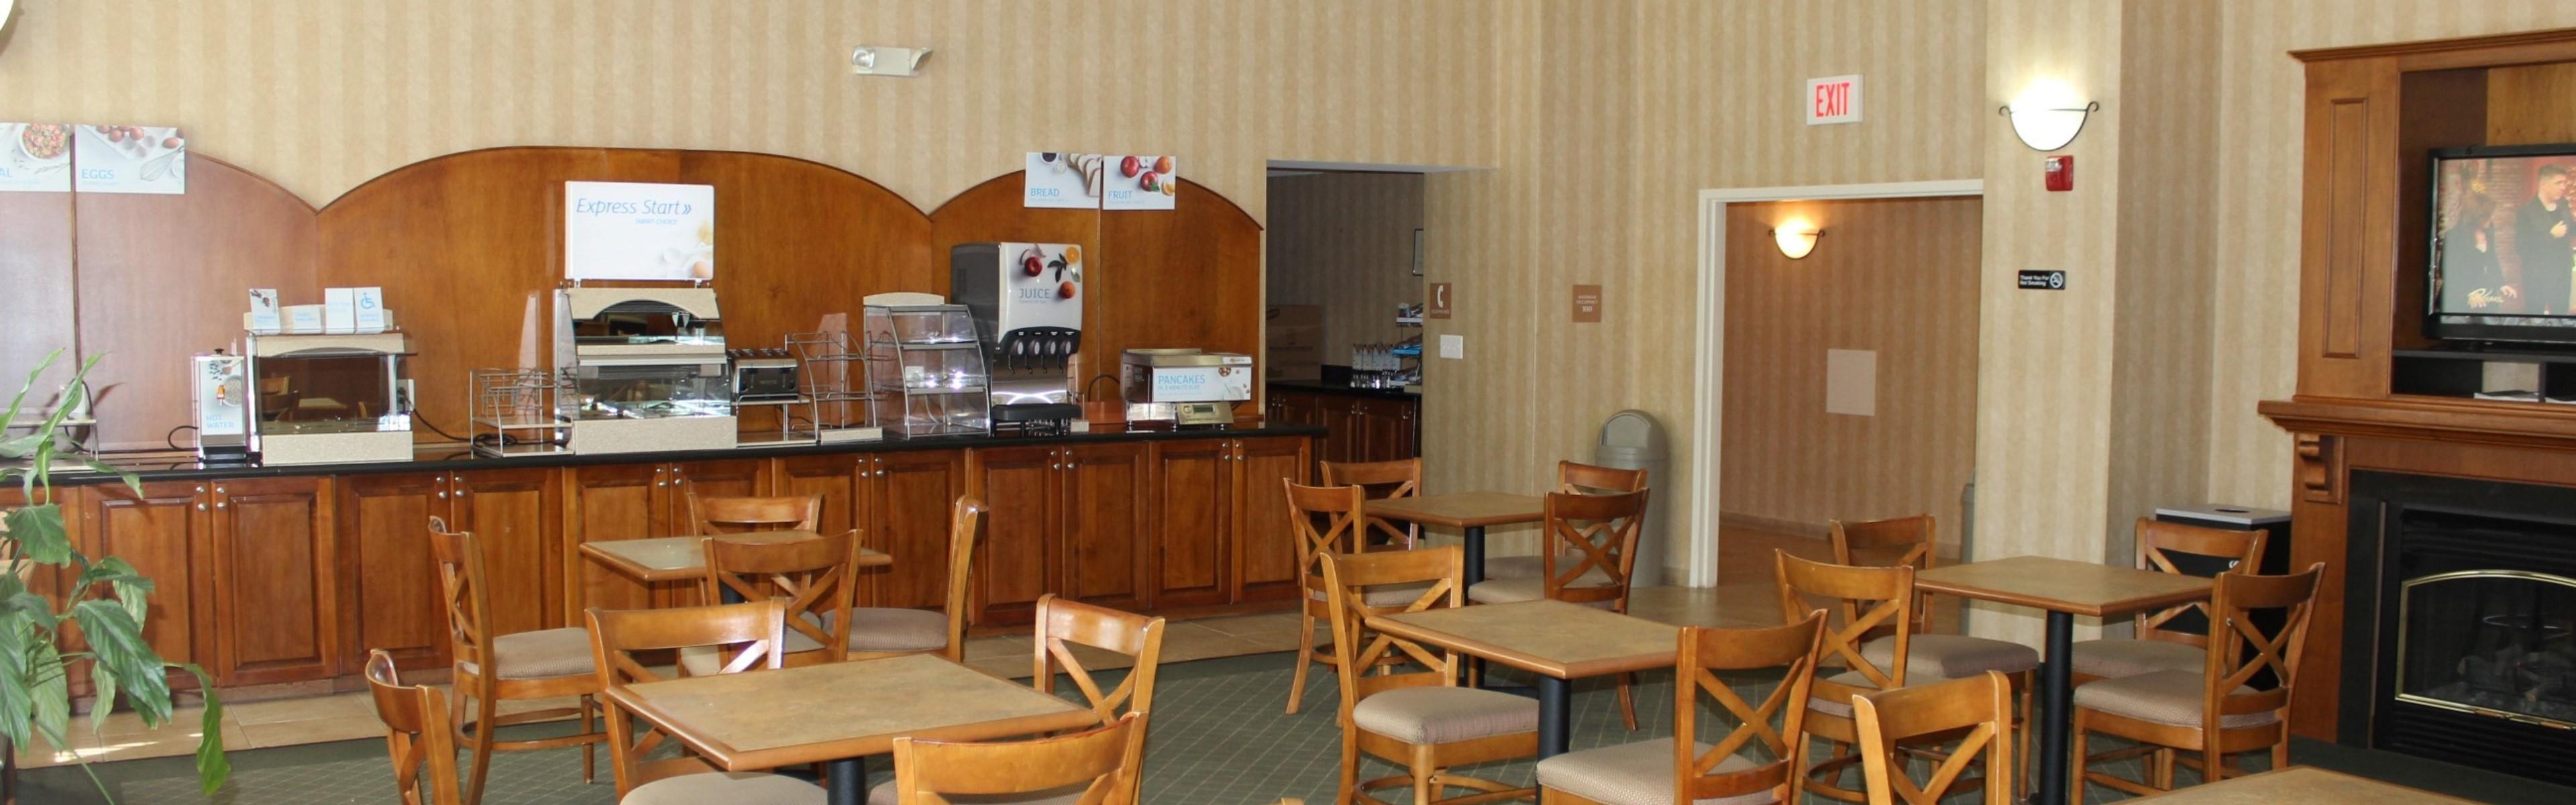 Warrenton Va Hotels Motels